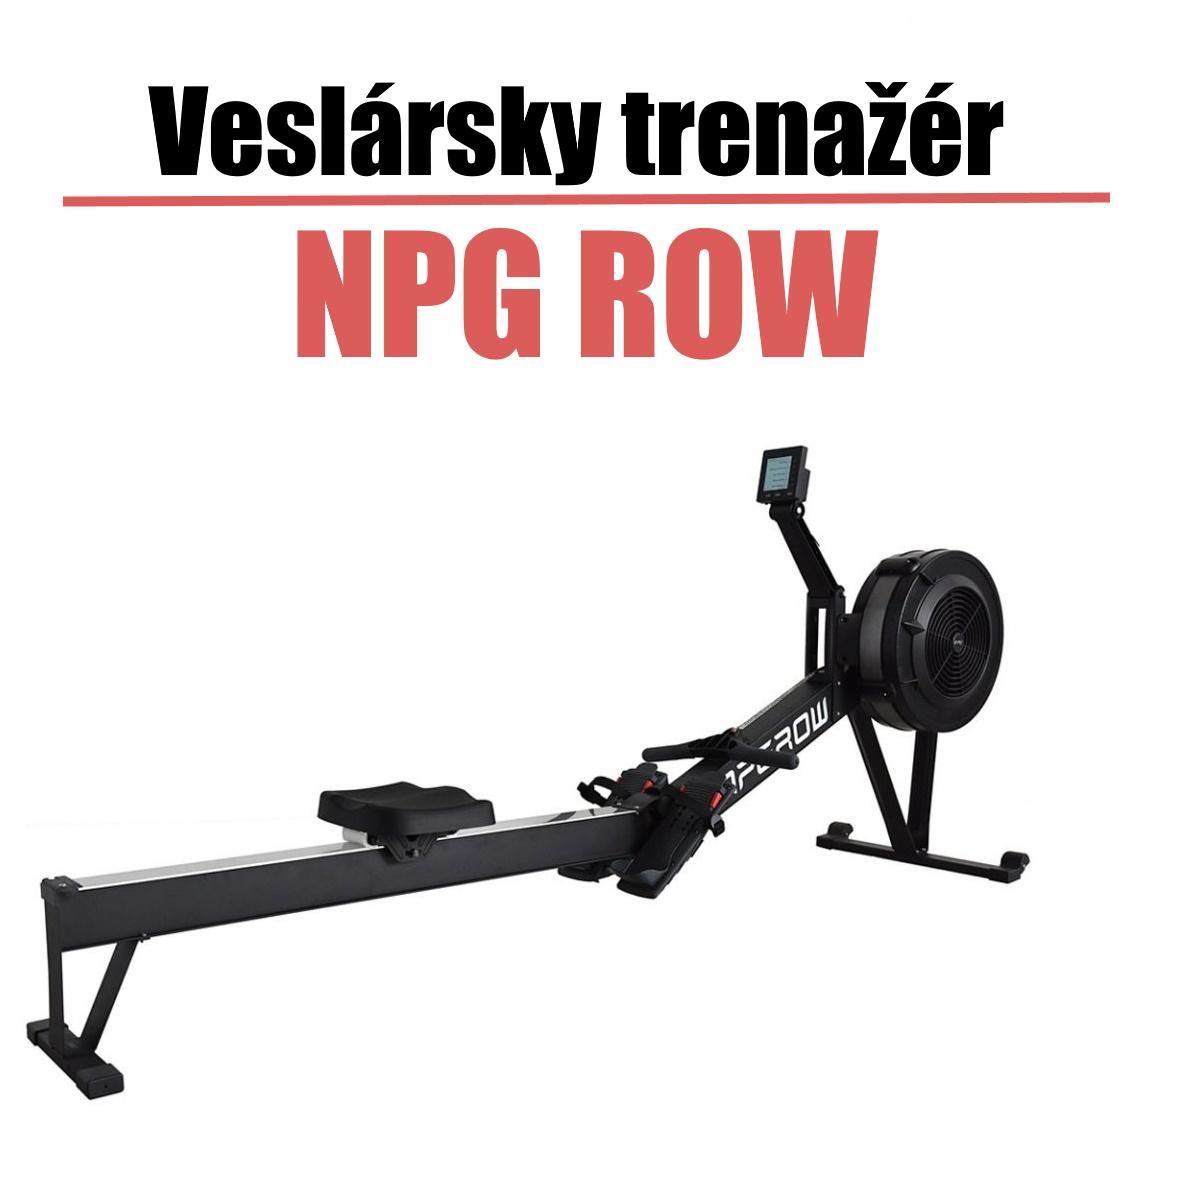 Veslársky trenažér - VESLO NPG ROW